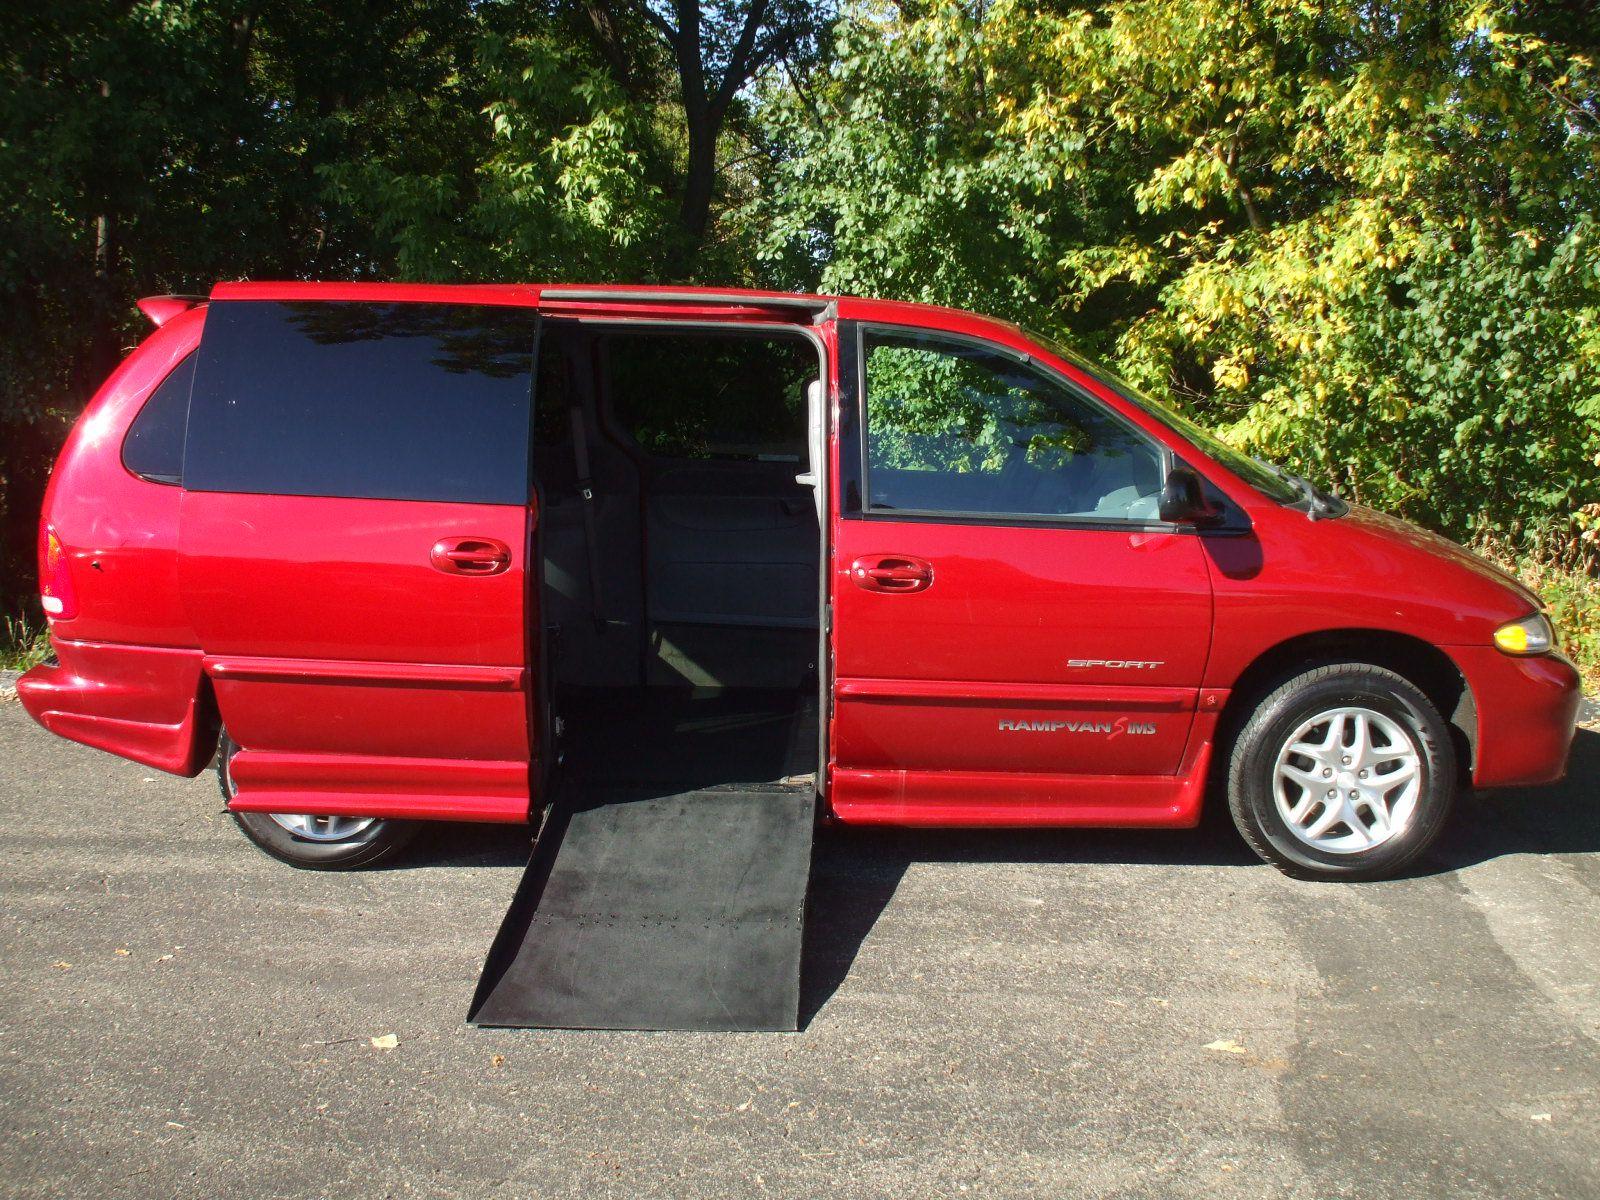 2000 dodge grand caravan sport stock 14453w wheelchair van for sale gresham driving aids. Black Bedroom Furniture Sets. Home Design Ideas